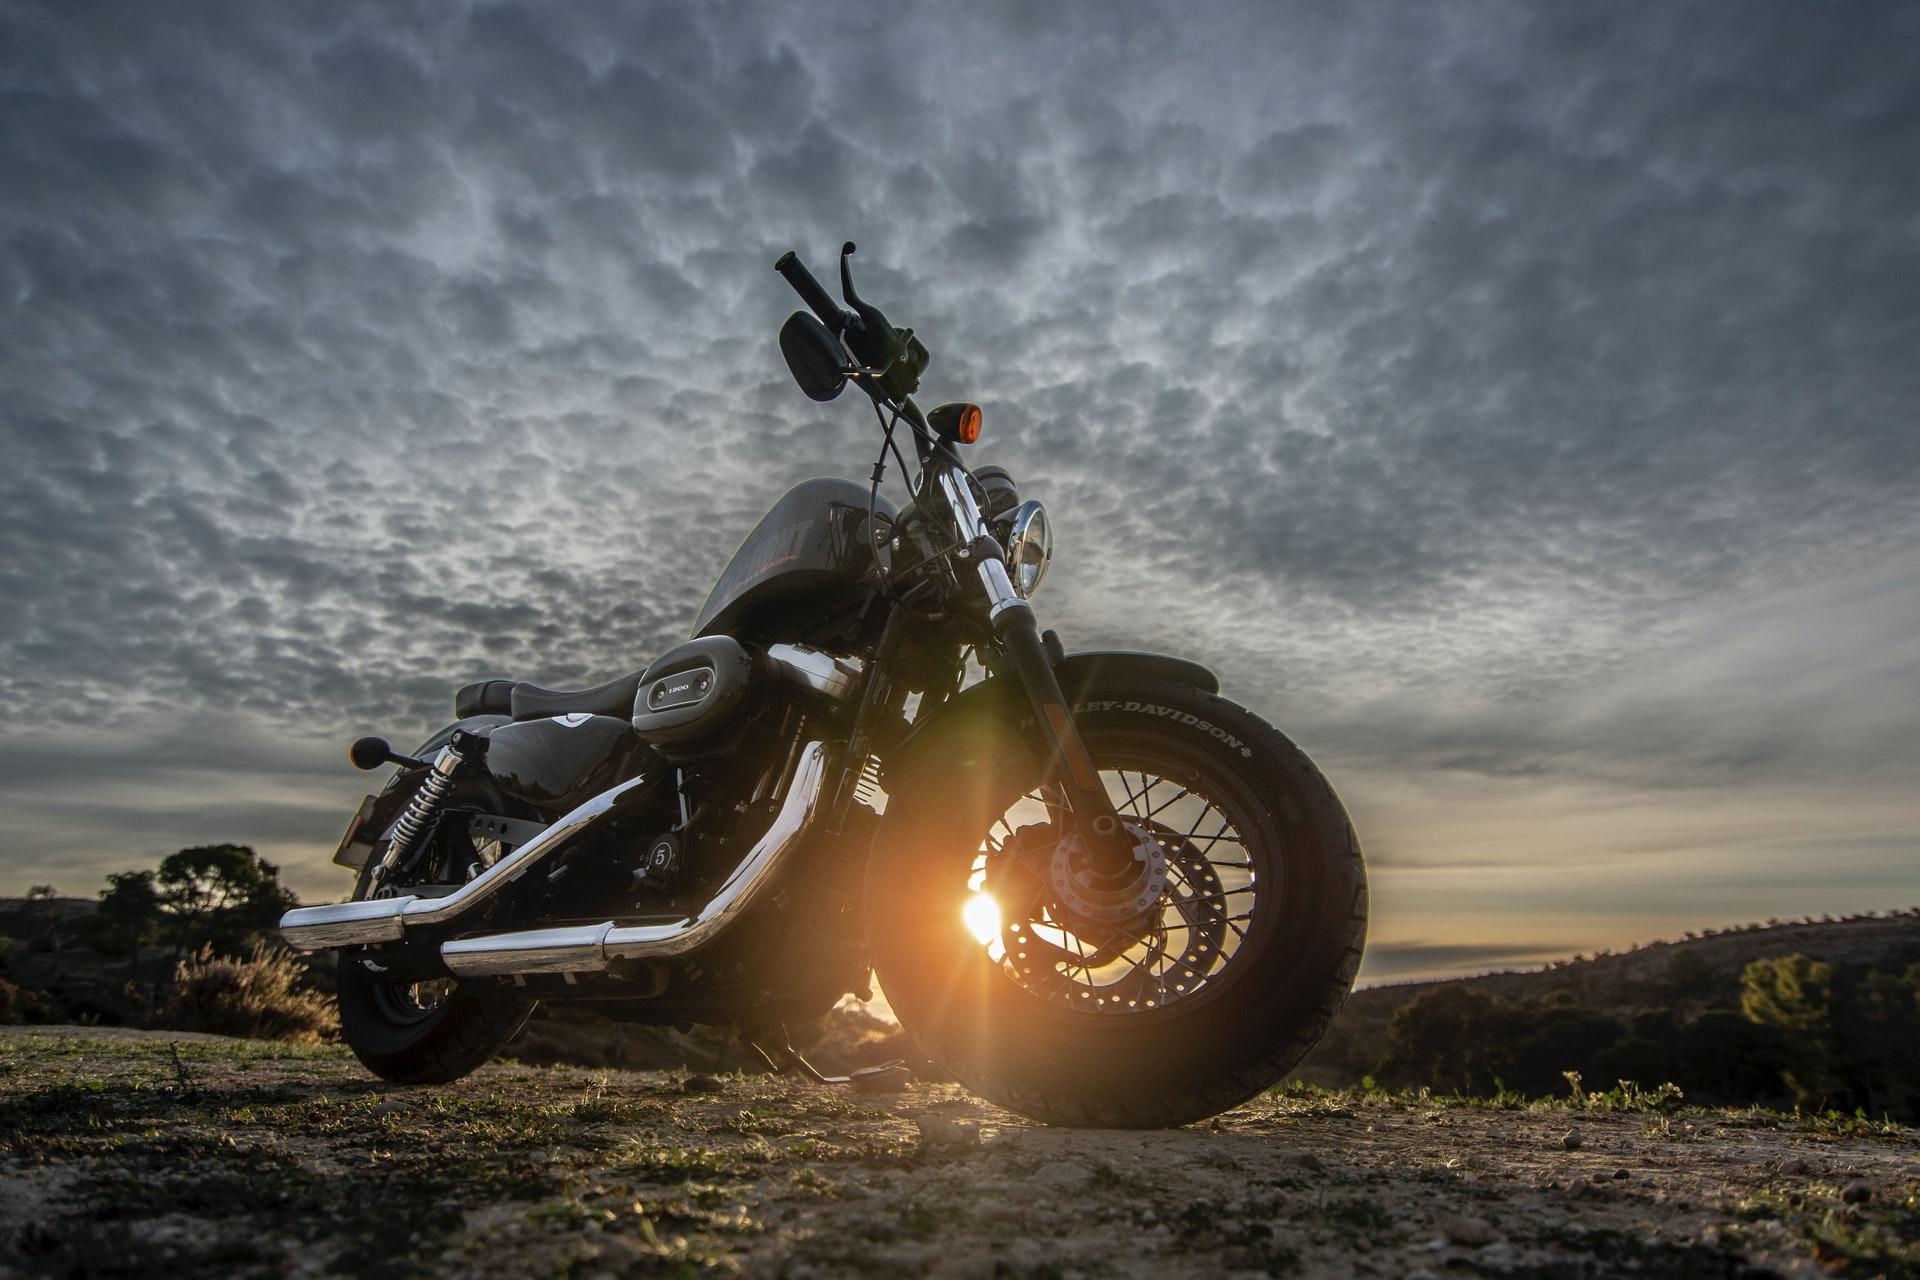 balade-ecologique a moto